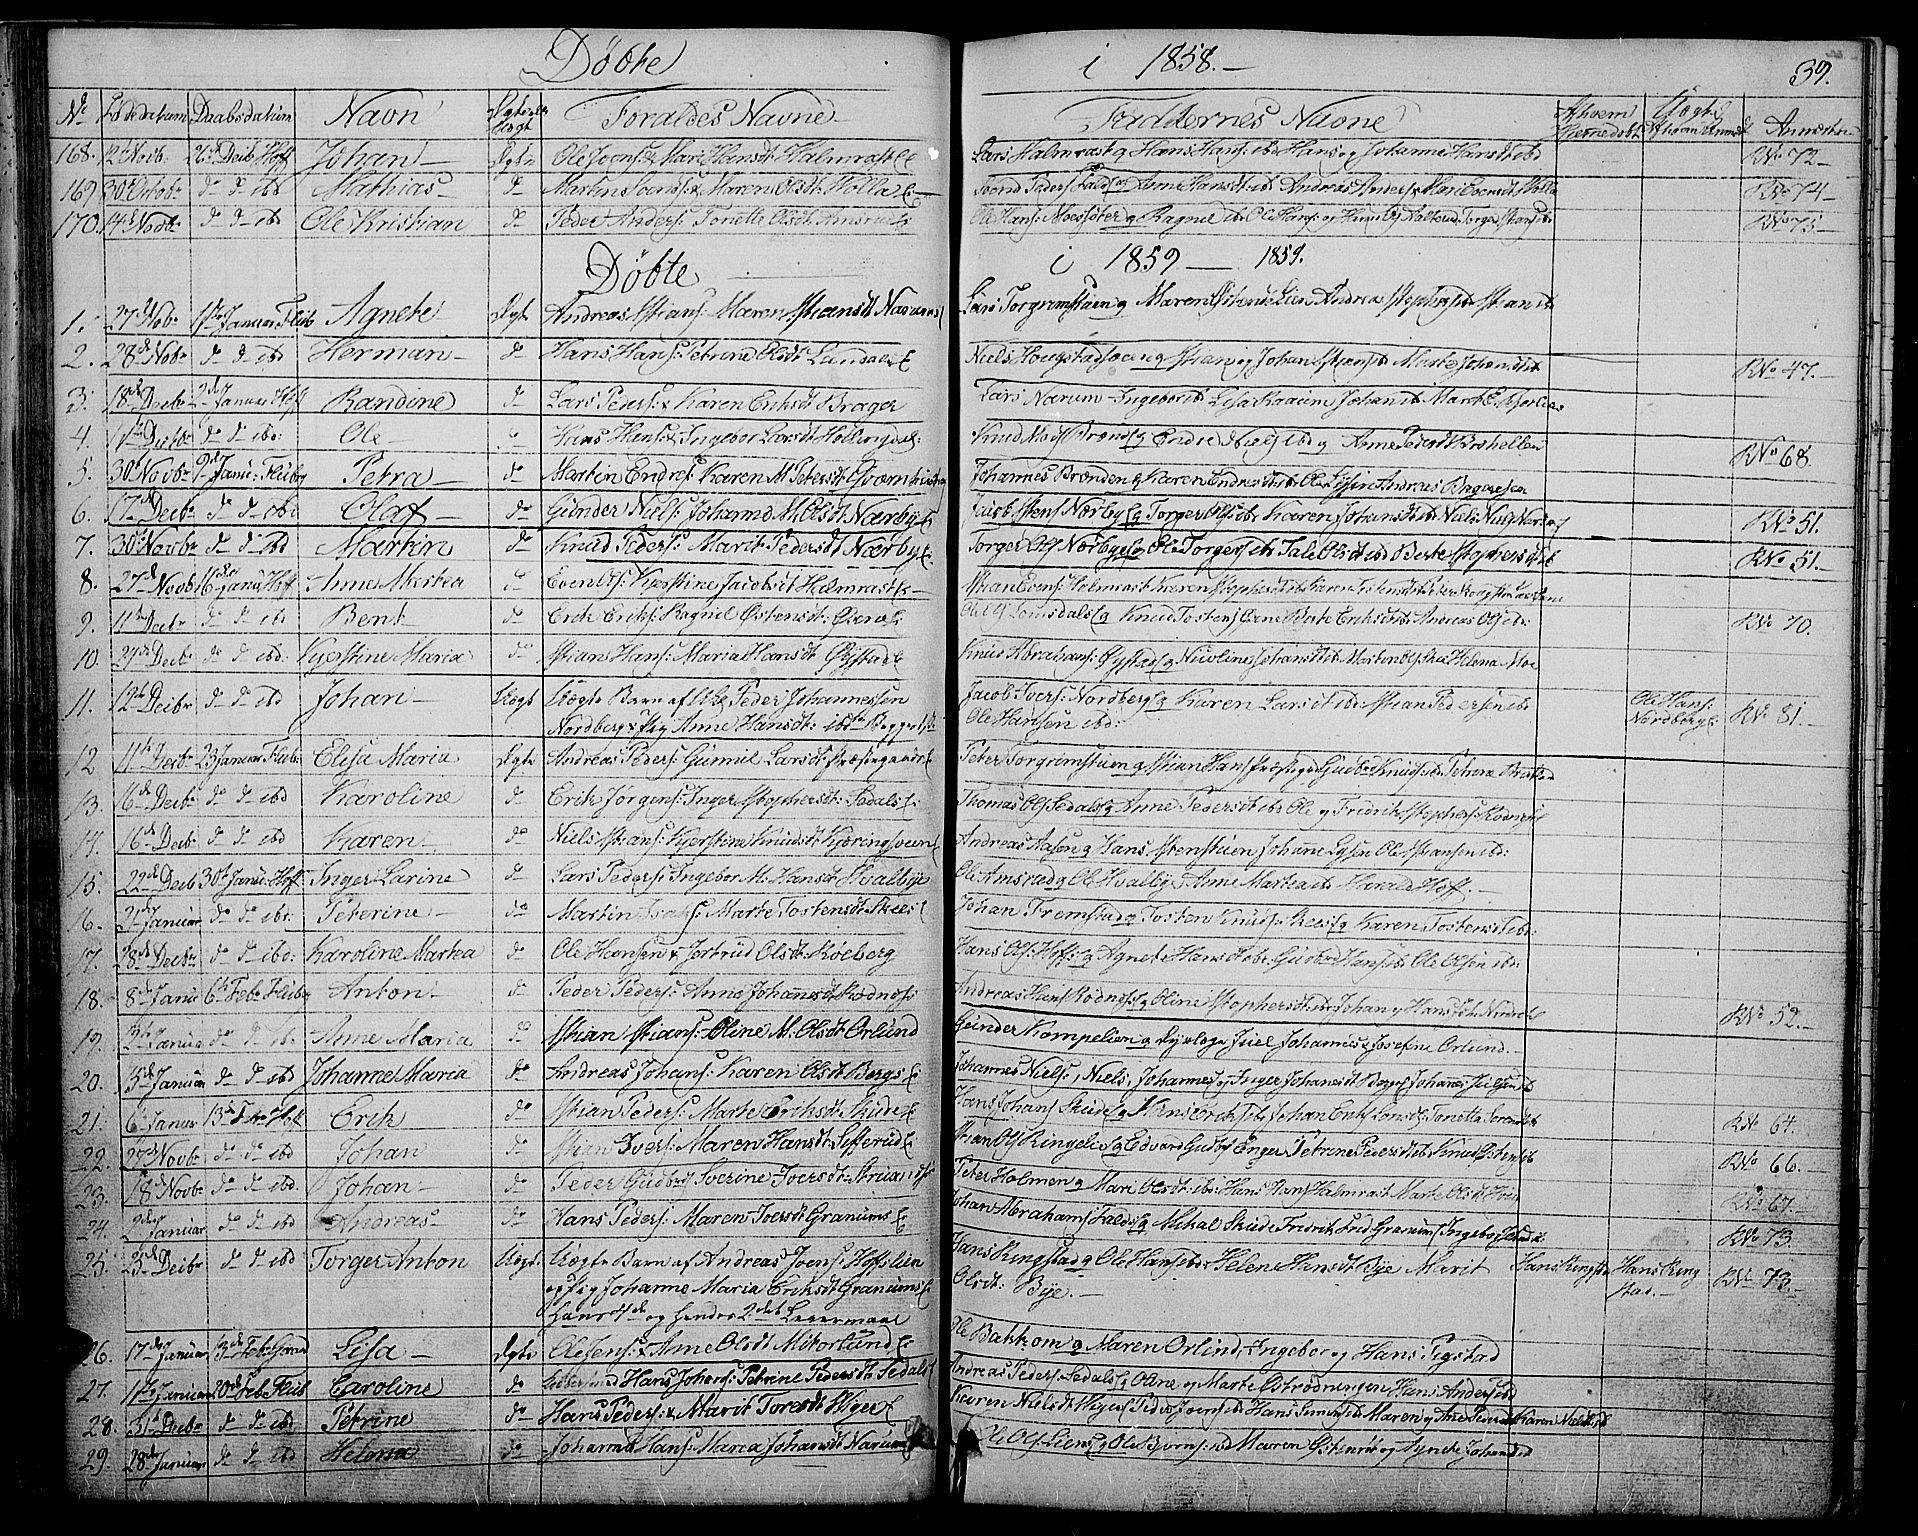 SAH, Søndre Land prestekontor, L/L0001: Klokkerbok nr. 1, 1849-1883, s. 39